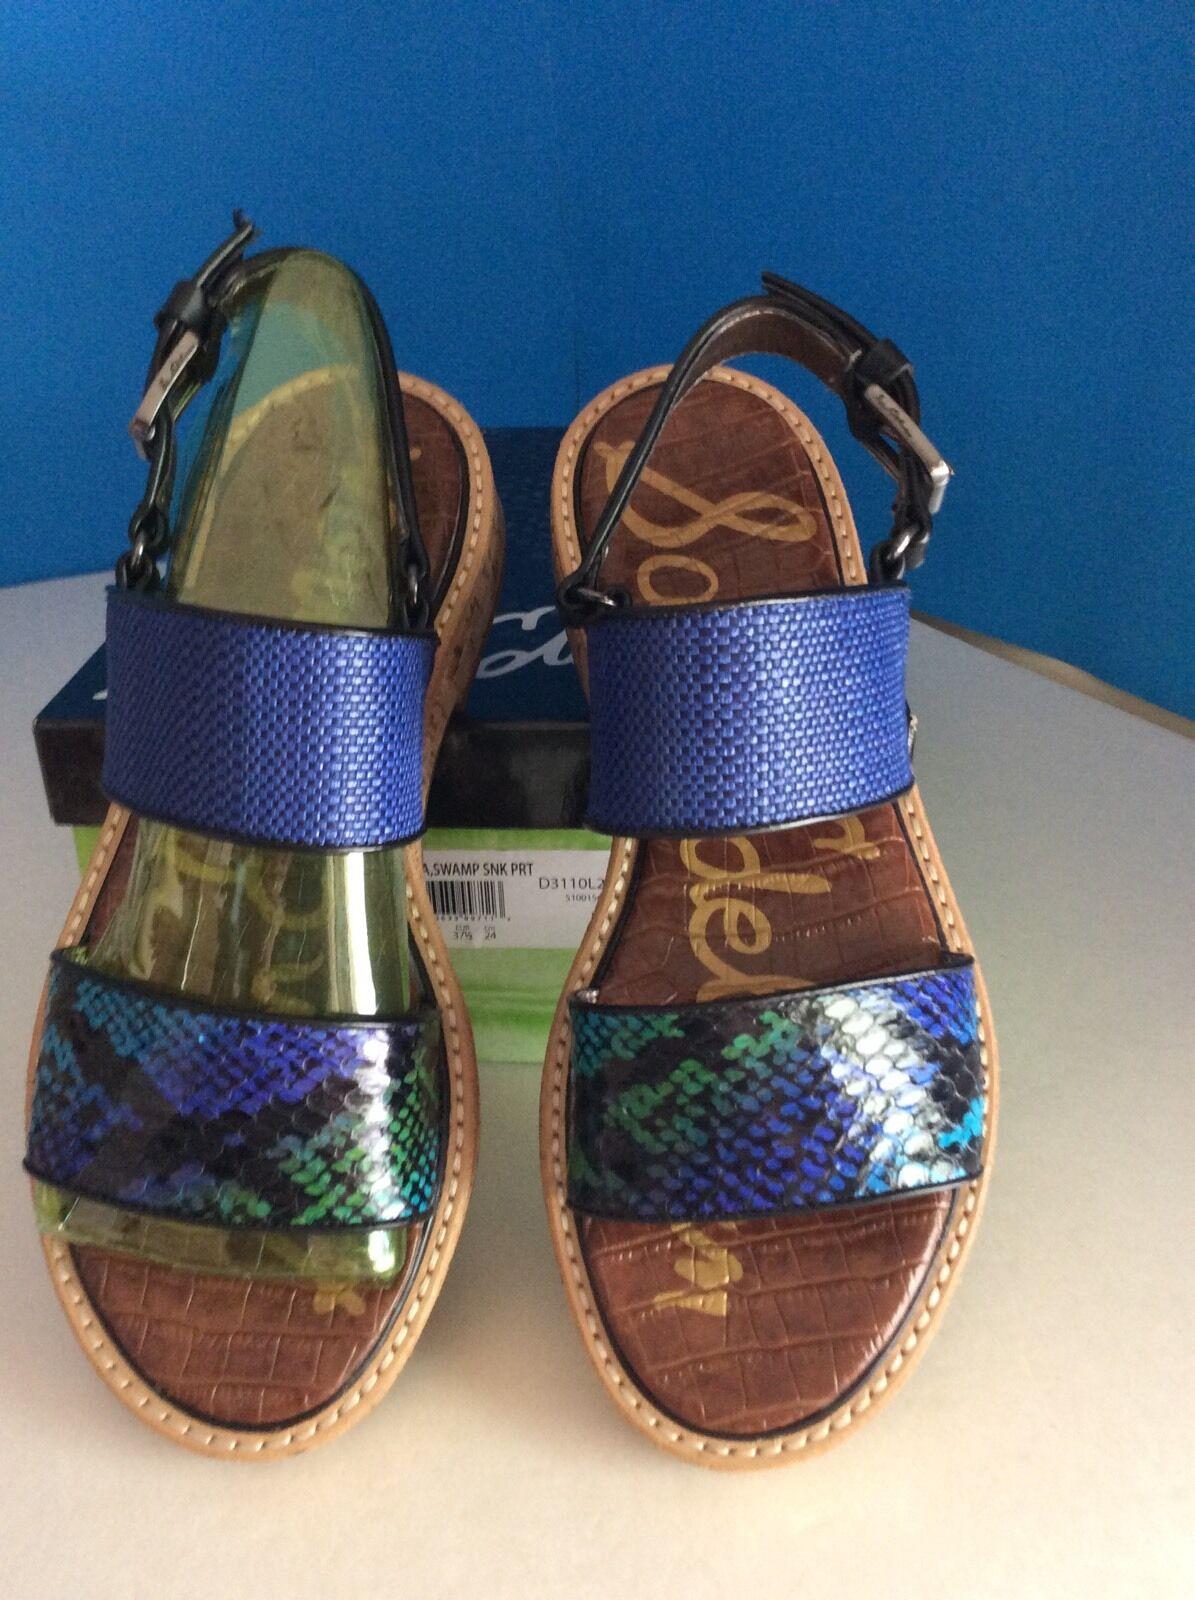 Sam Edelman Nia bluee Leather Snakeskin Cork Heel Sandals Size 7M NEW